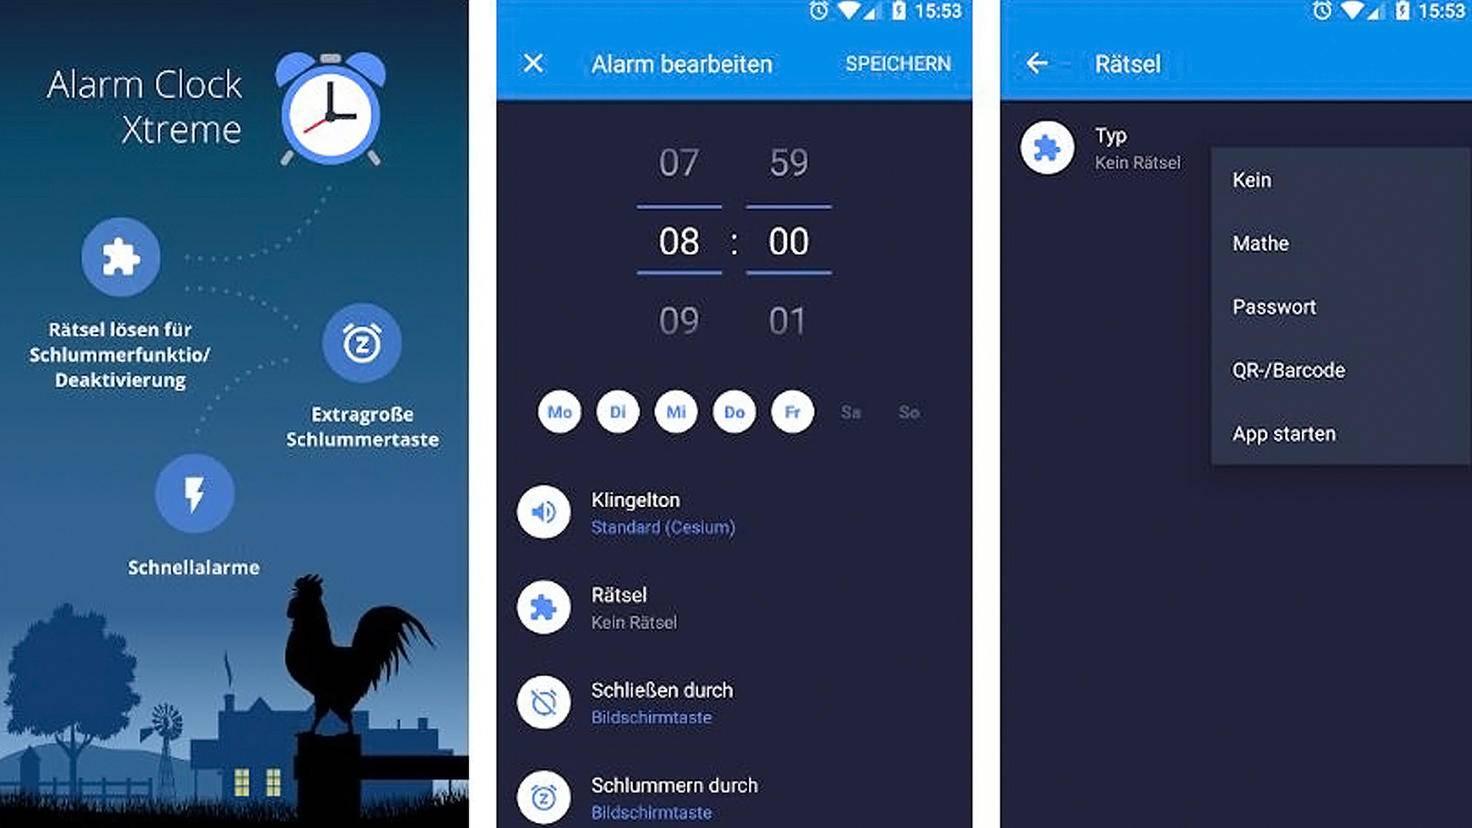 Alarm Clock Xtreme-Google Play Store-AVG Labs